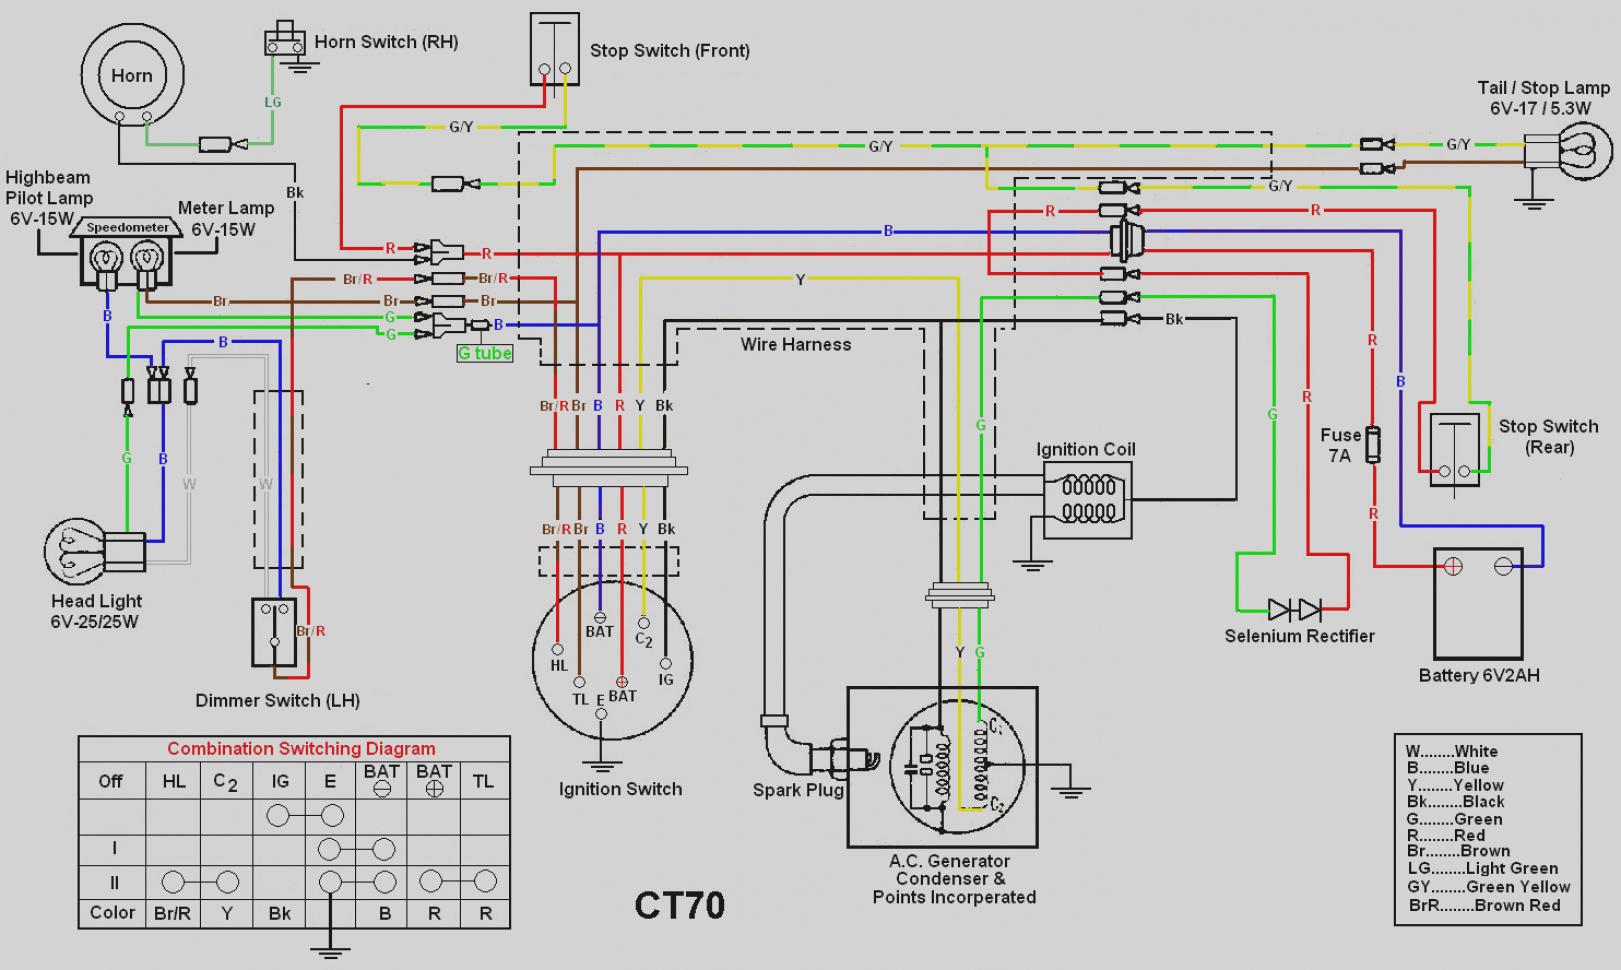 Magnificent Honda Ct70 Stator Wiring Diagram Wiring Diagram Wiring Cloud Hisonepsysticxongrecoveryedborg